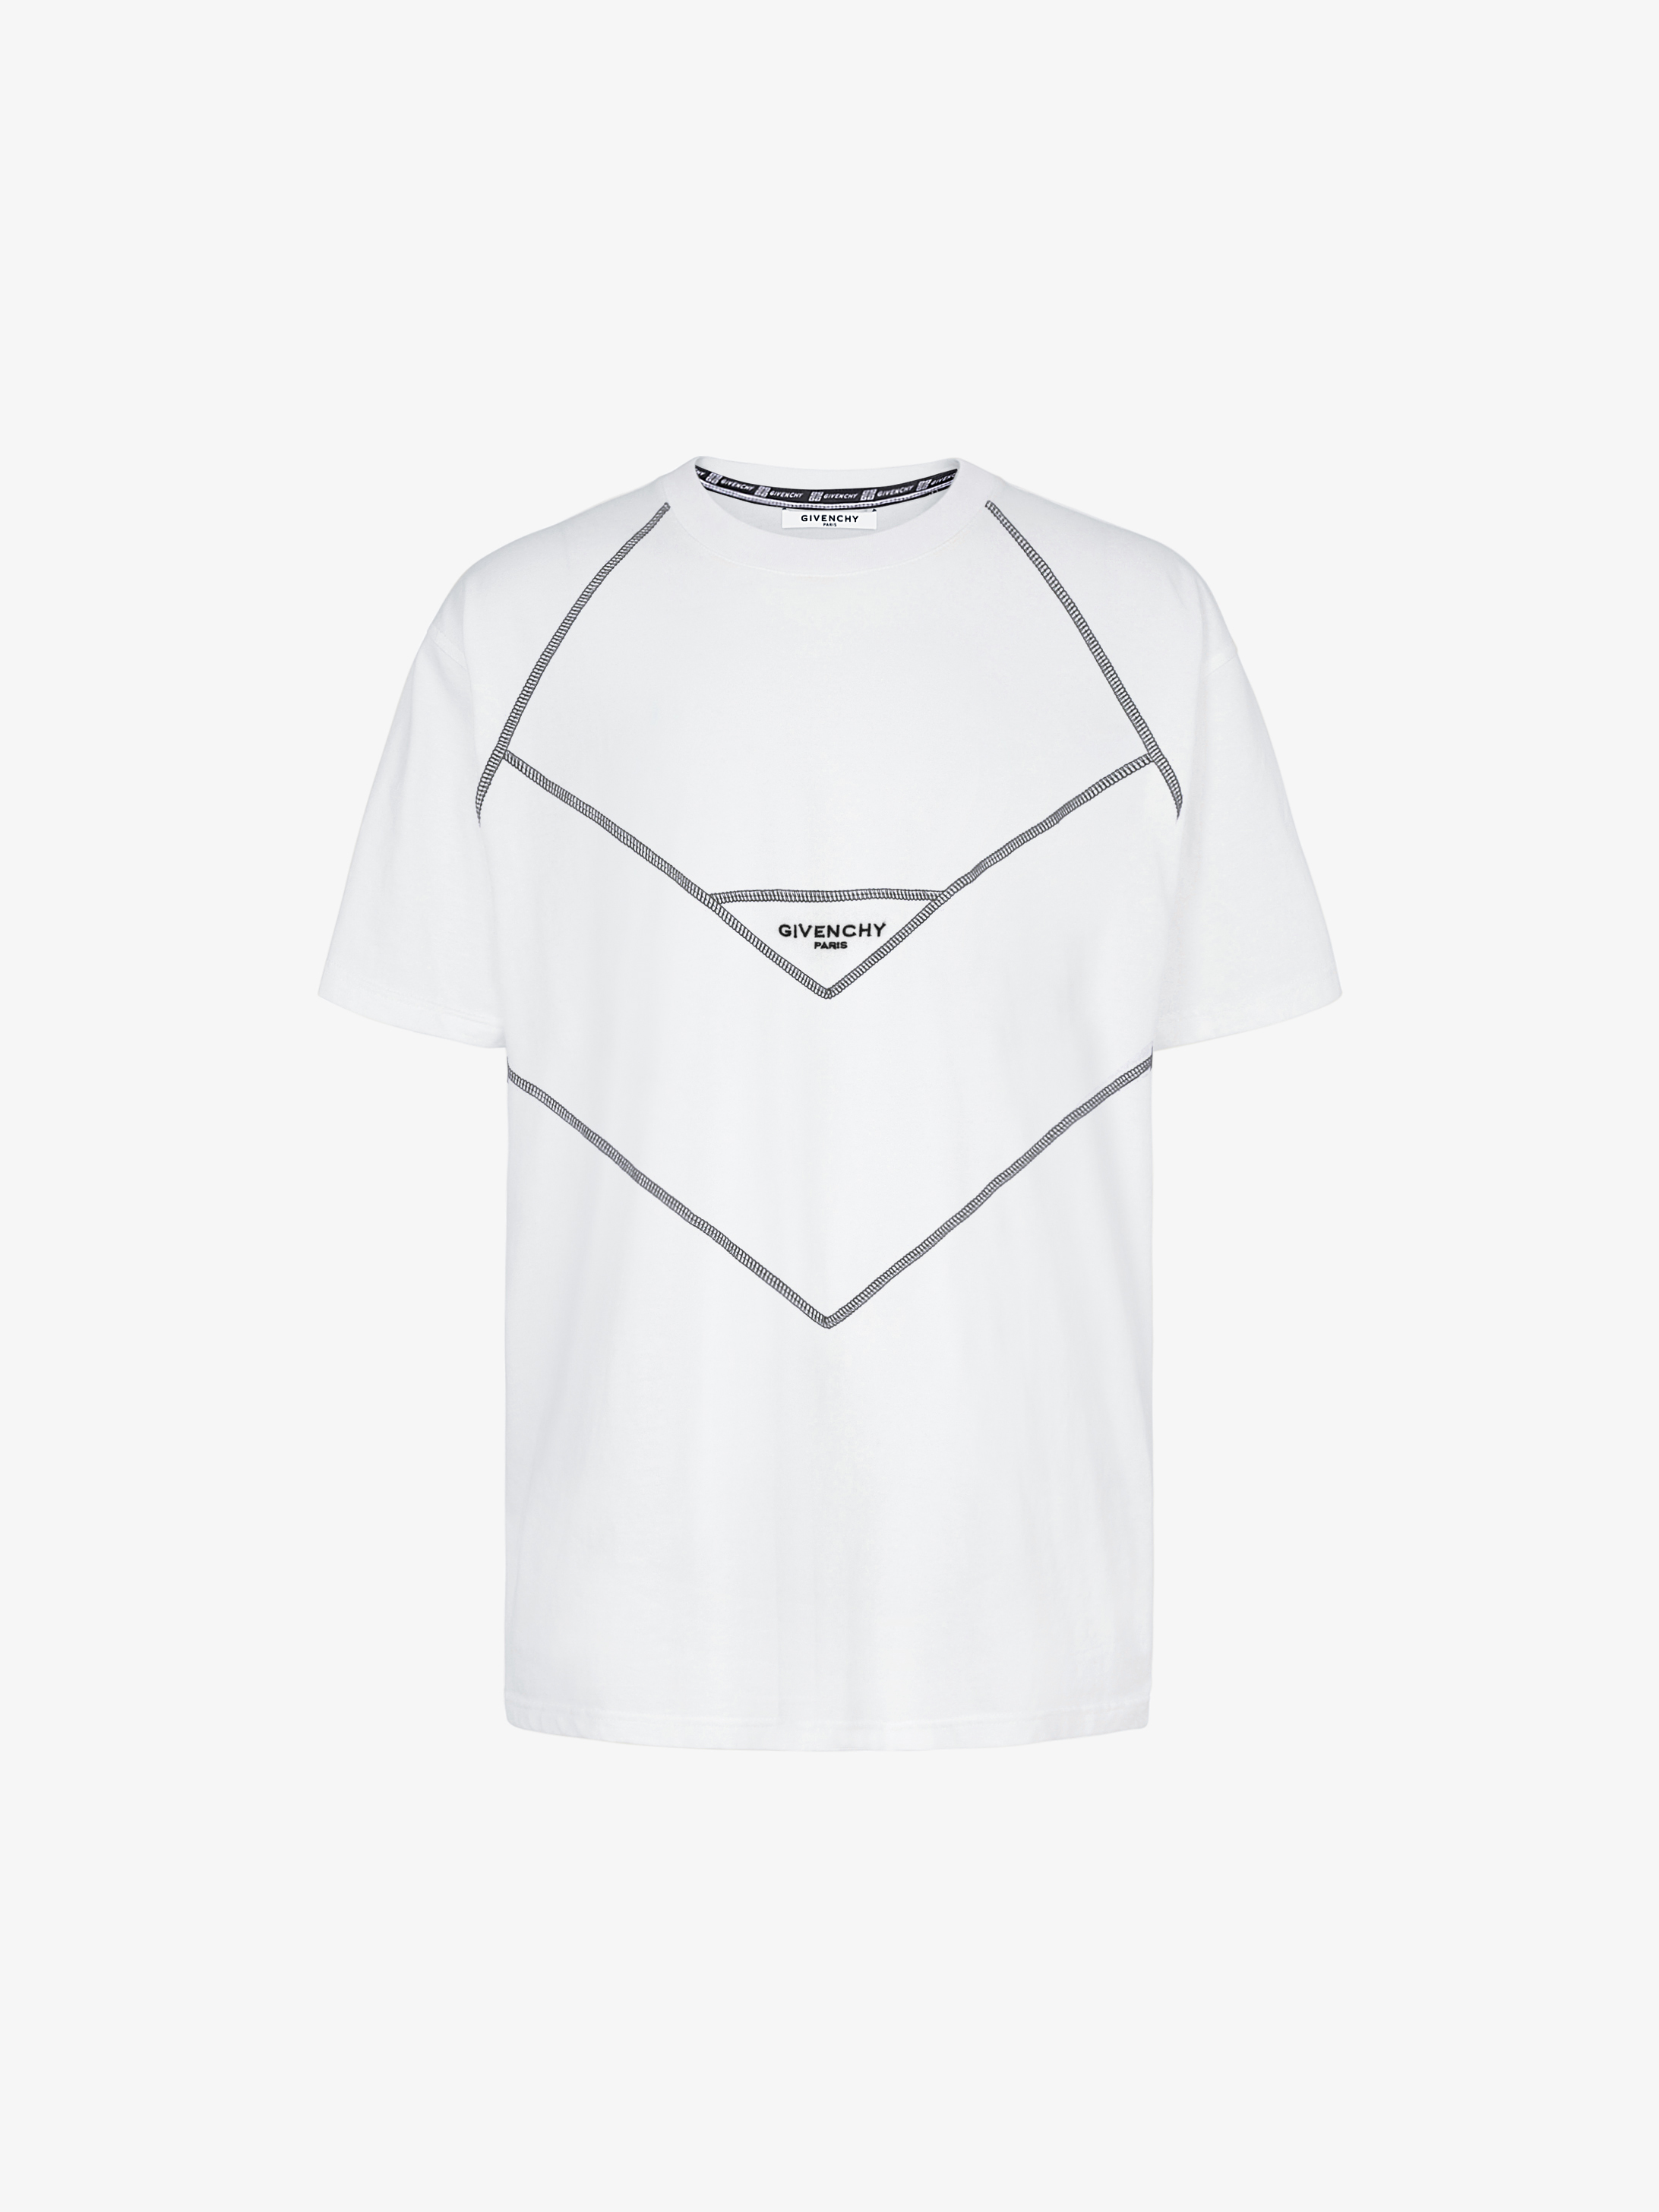 GIVENCHY PARIS contrasting stitching T-shirt